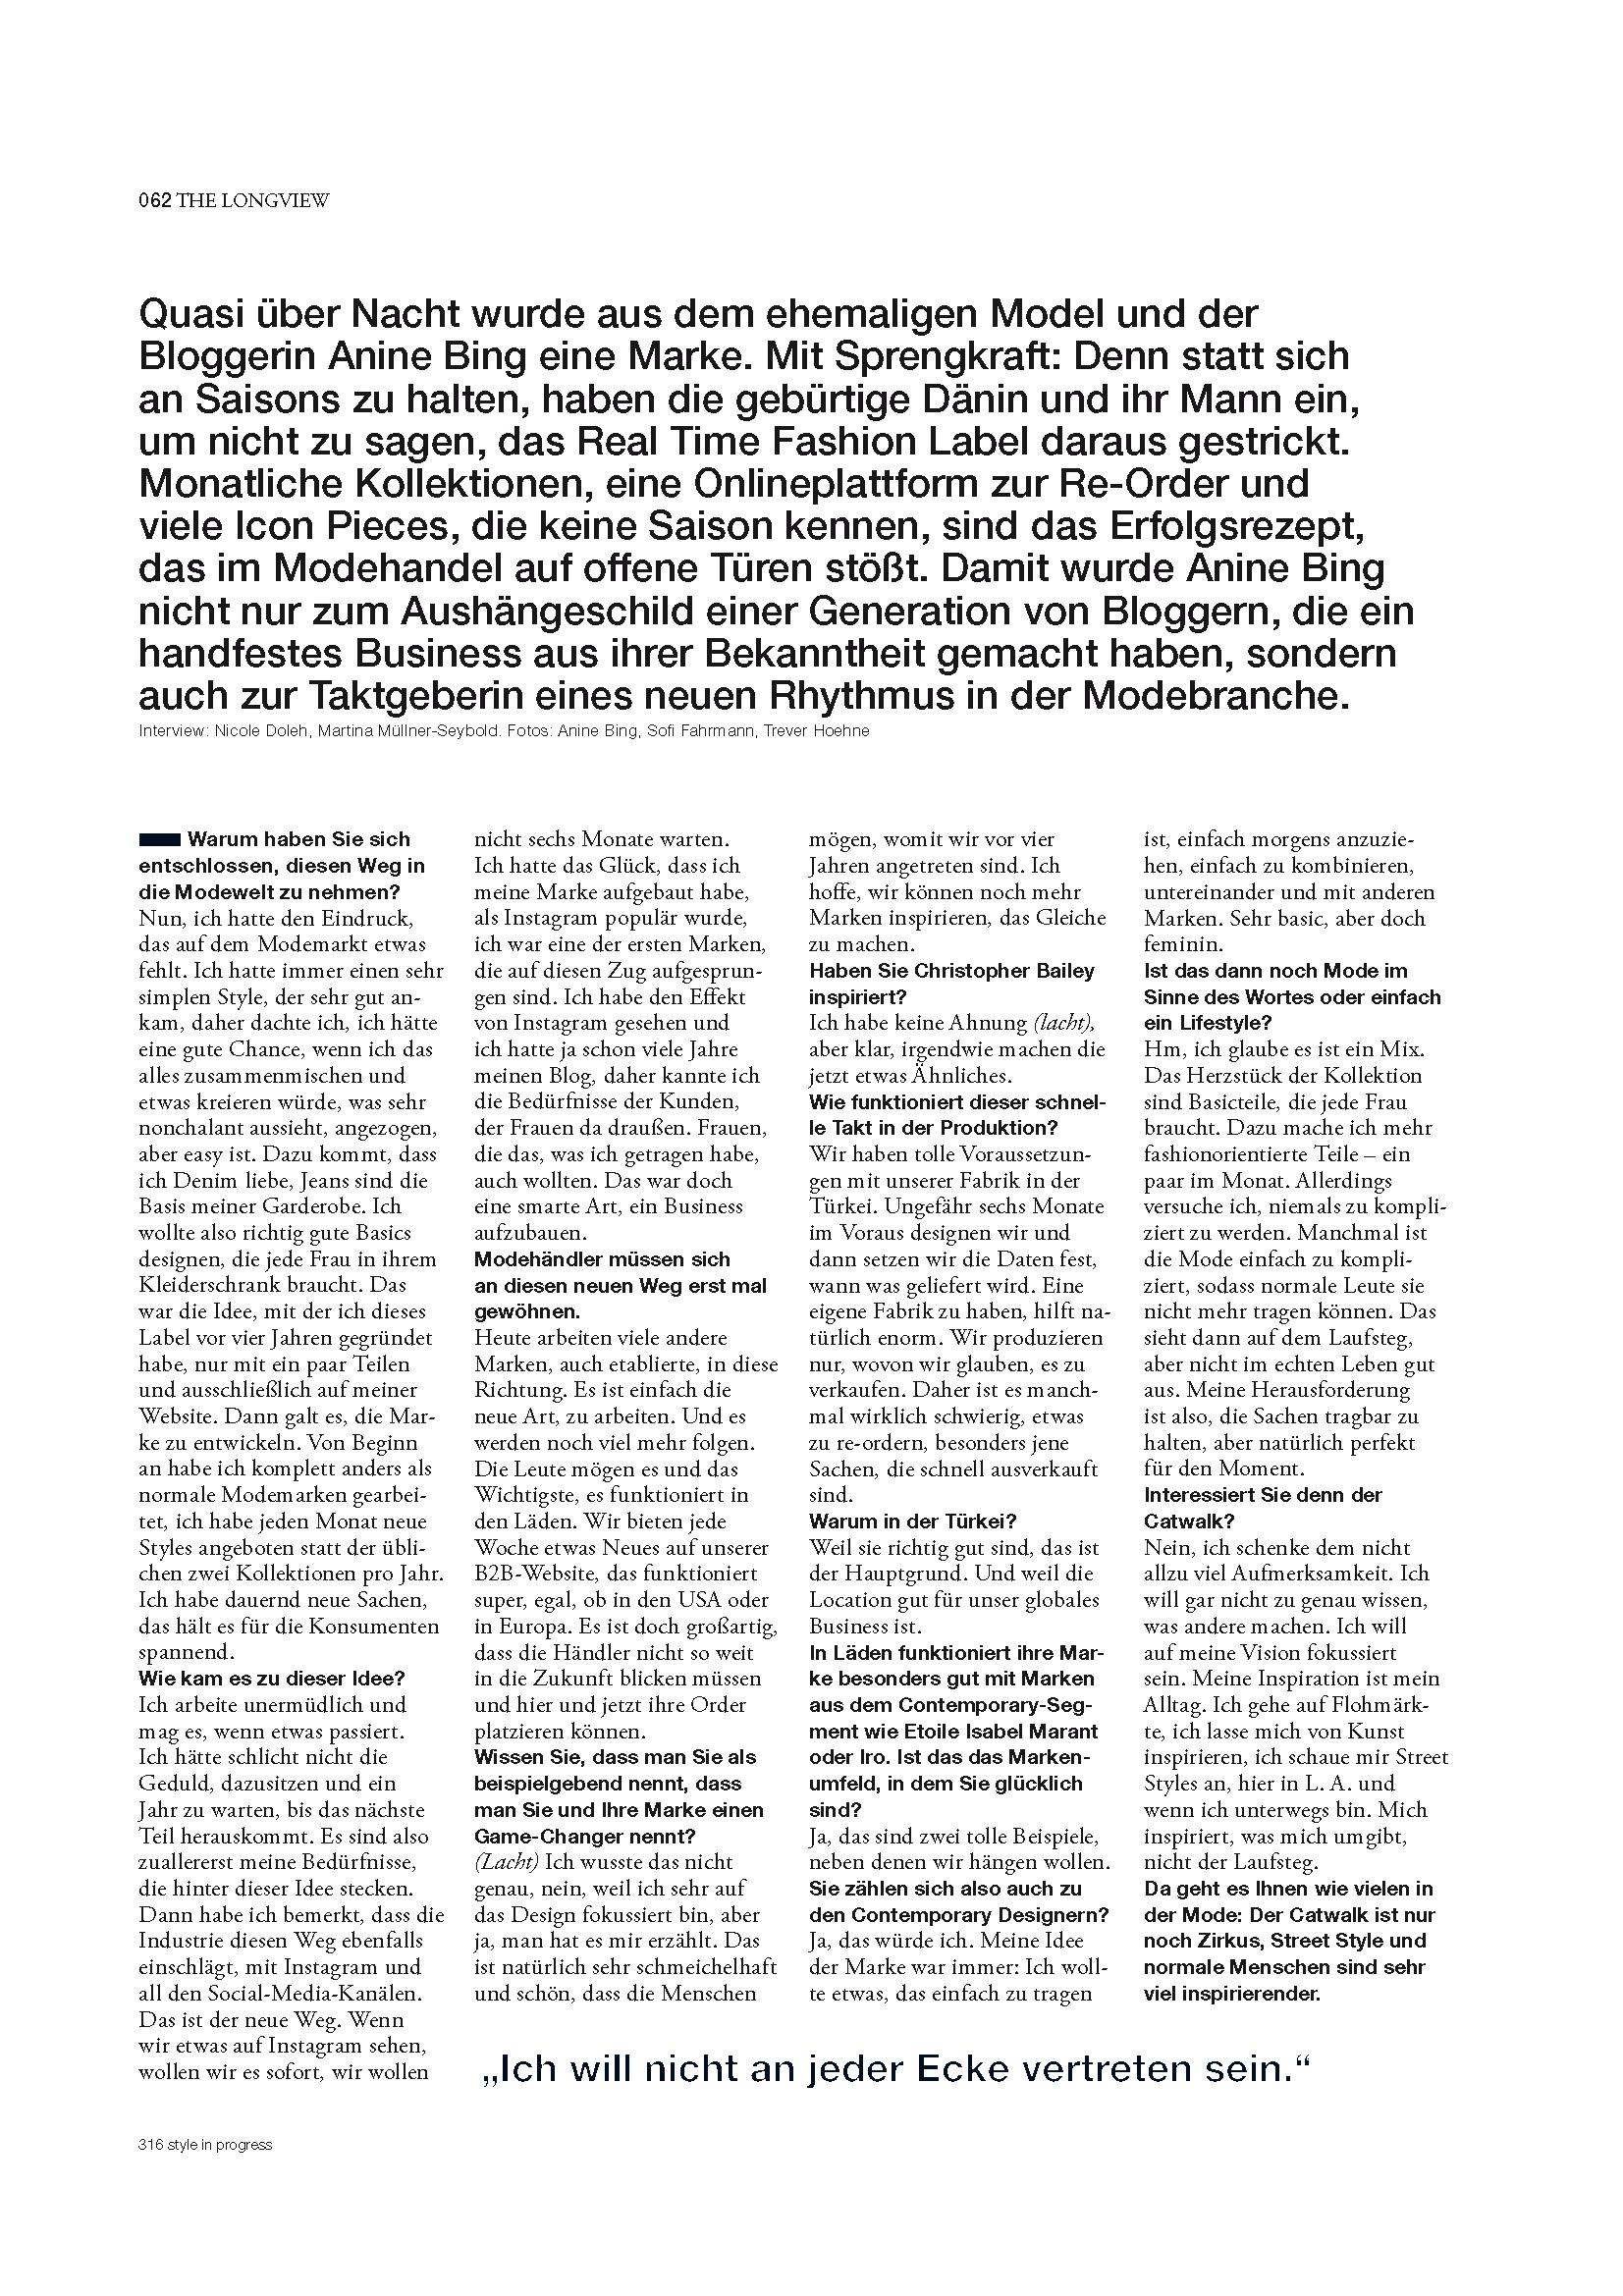 SIP316_DE_Longview_Anine_Bing_Seite_3